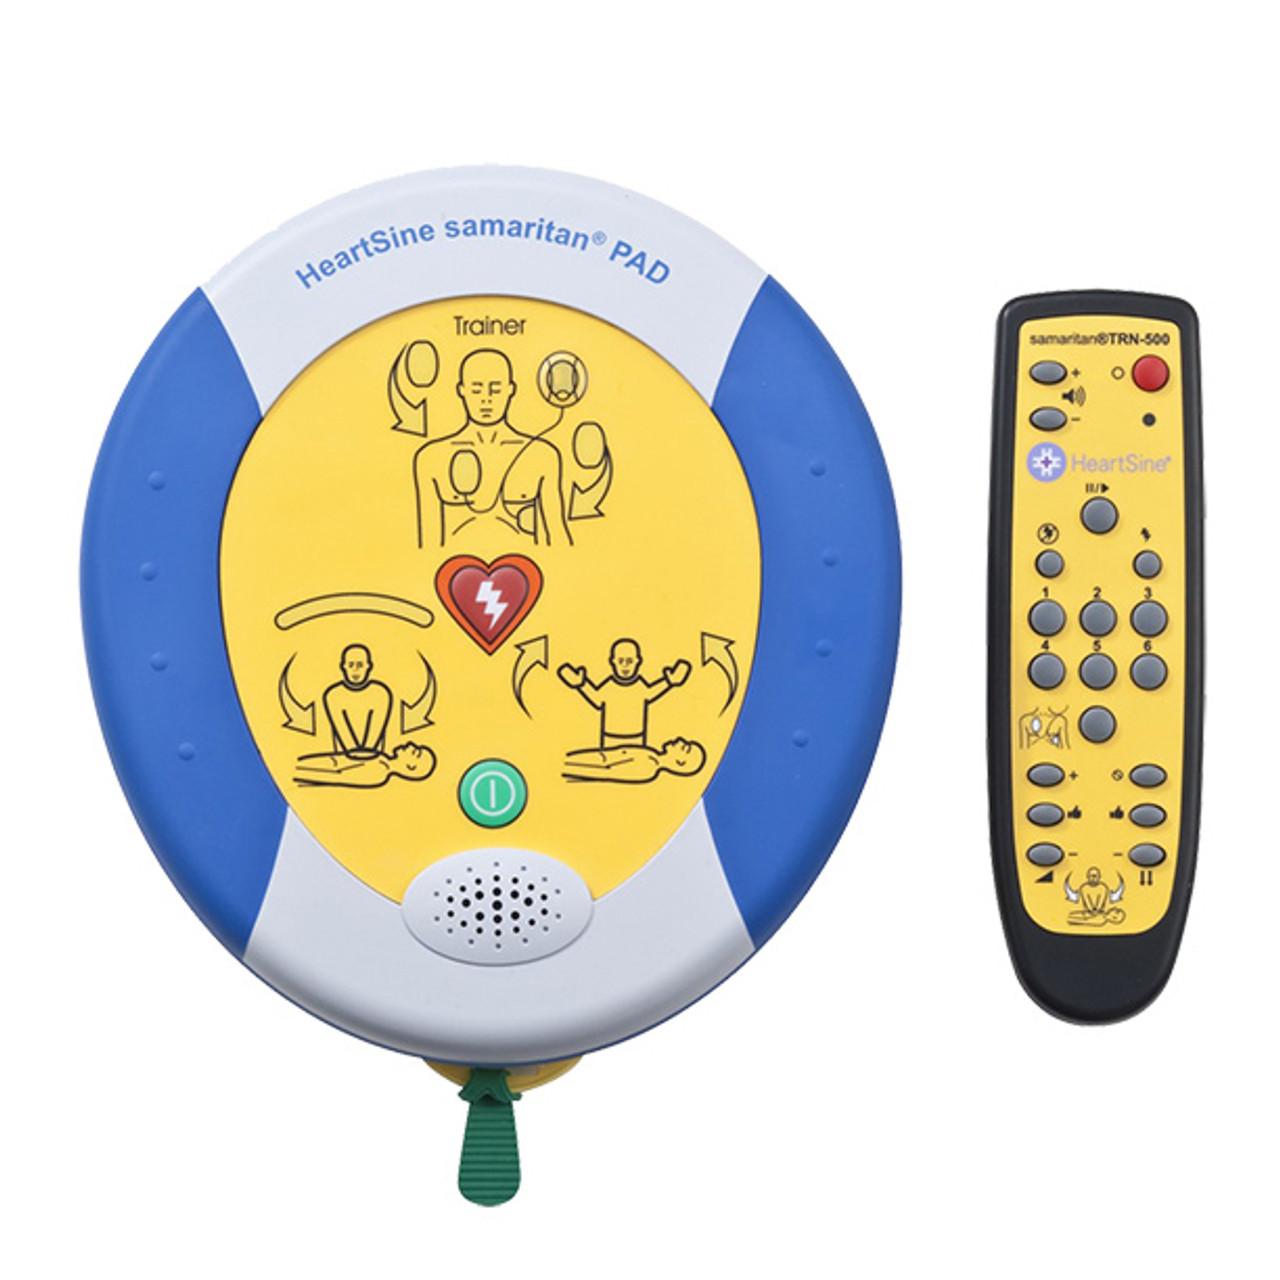 HeartSine Samaritan PAD 350P Trainer/Demo with remote